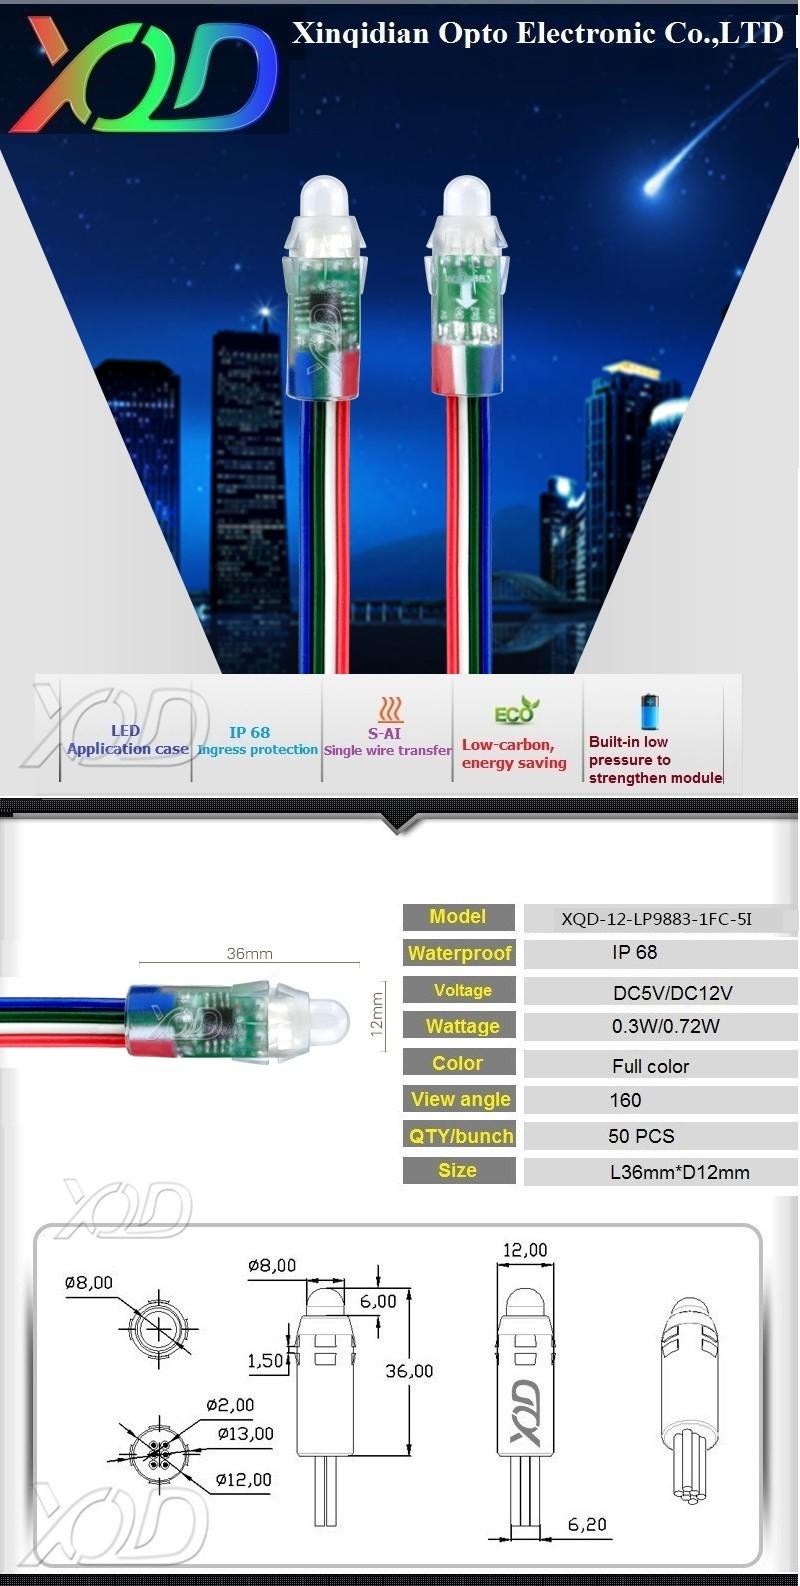 Wholesale Addressable WS2811 LED Pixel Digital Diffuse 12mm RGB Light P68 5V 12V